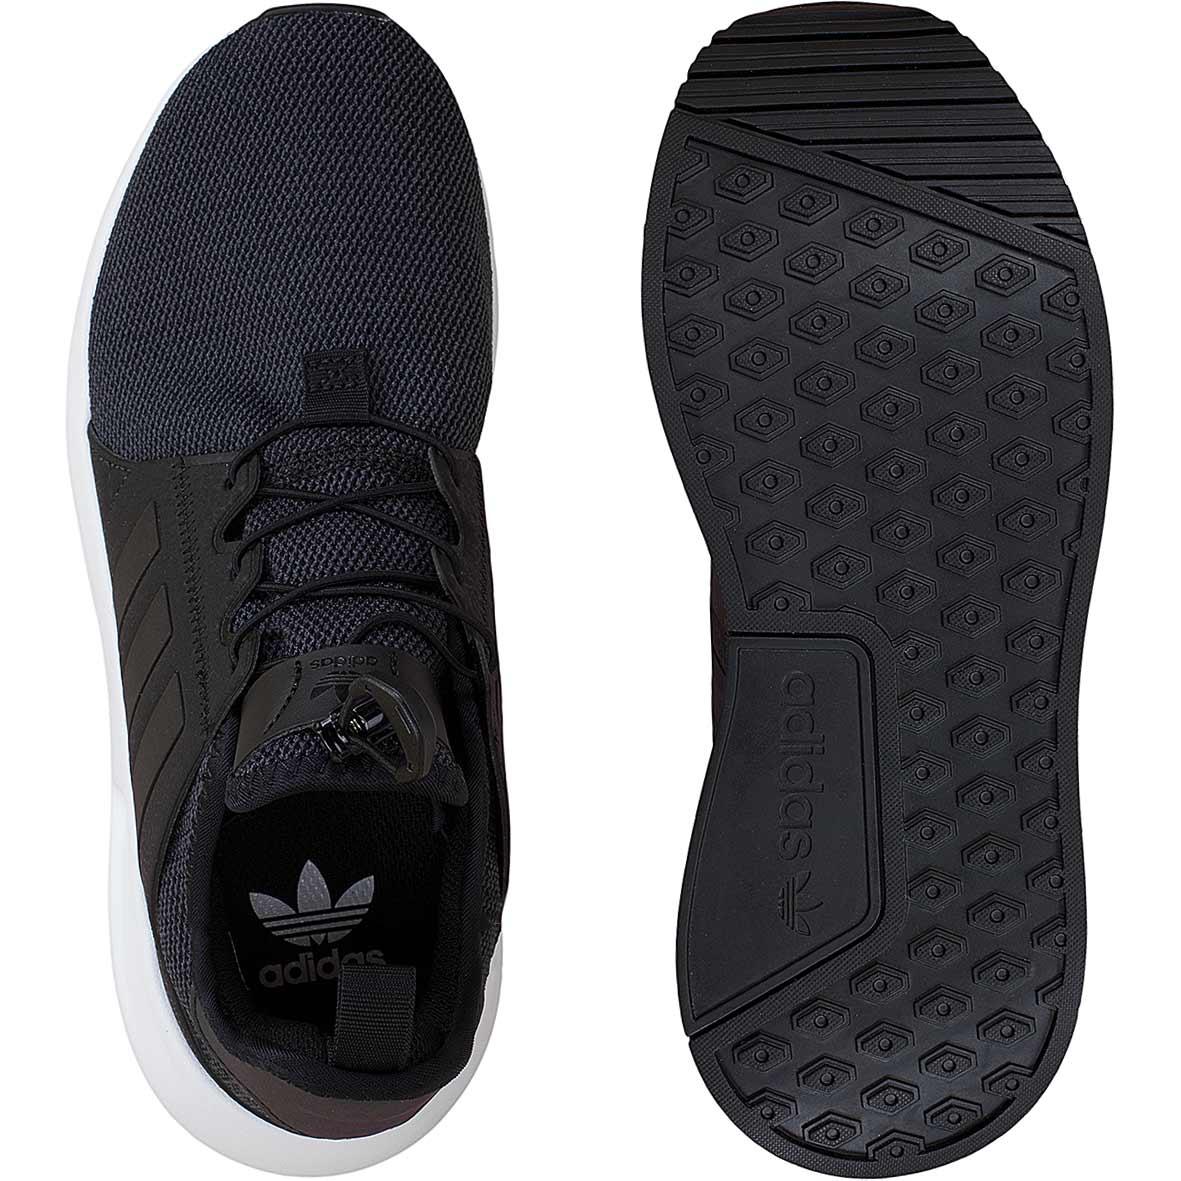 ☆ Adidas Originals Damen Sneaker X PLR schwarz/schwarz - hier ...